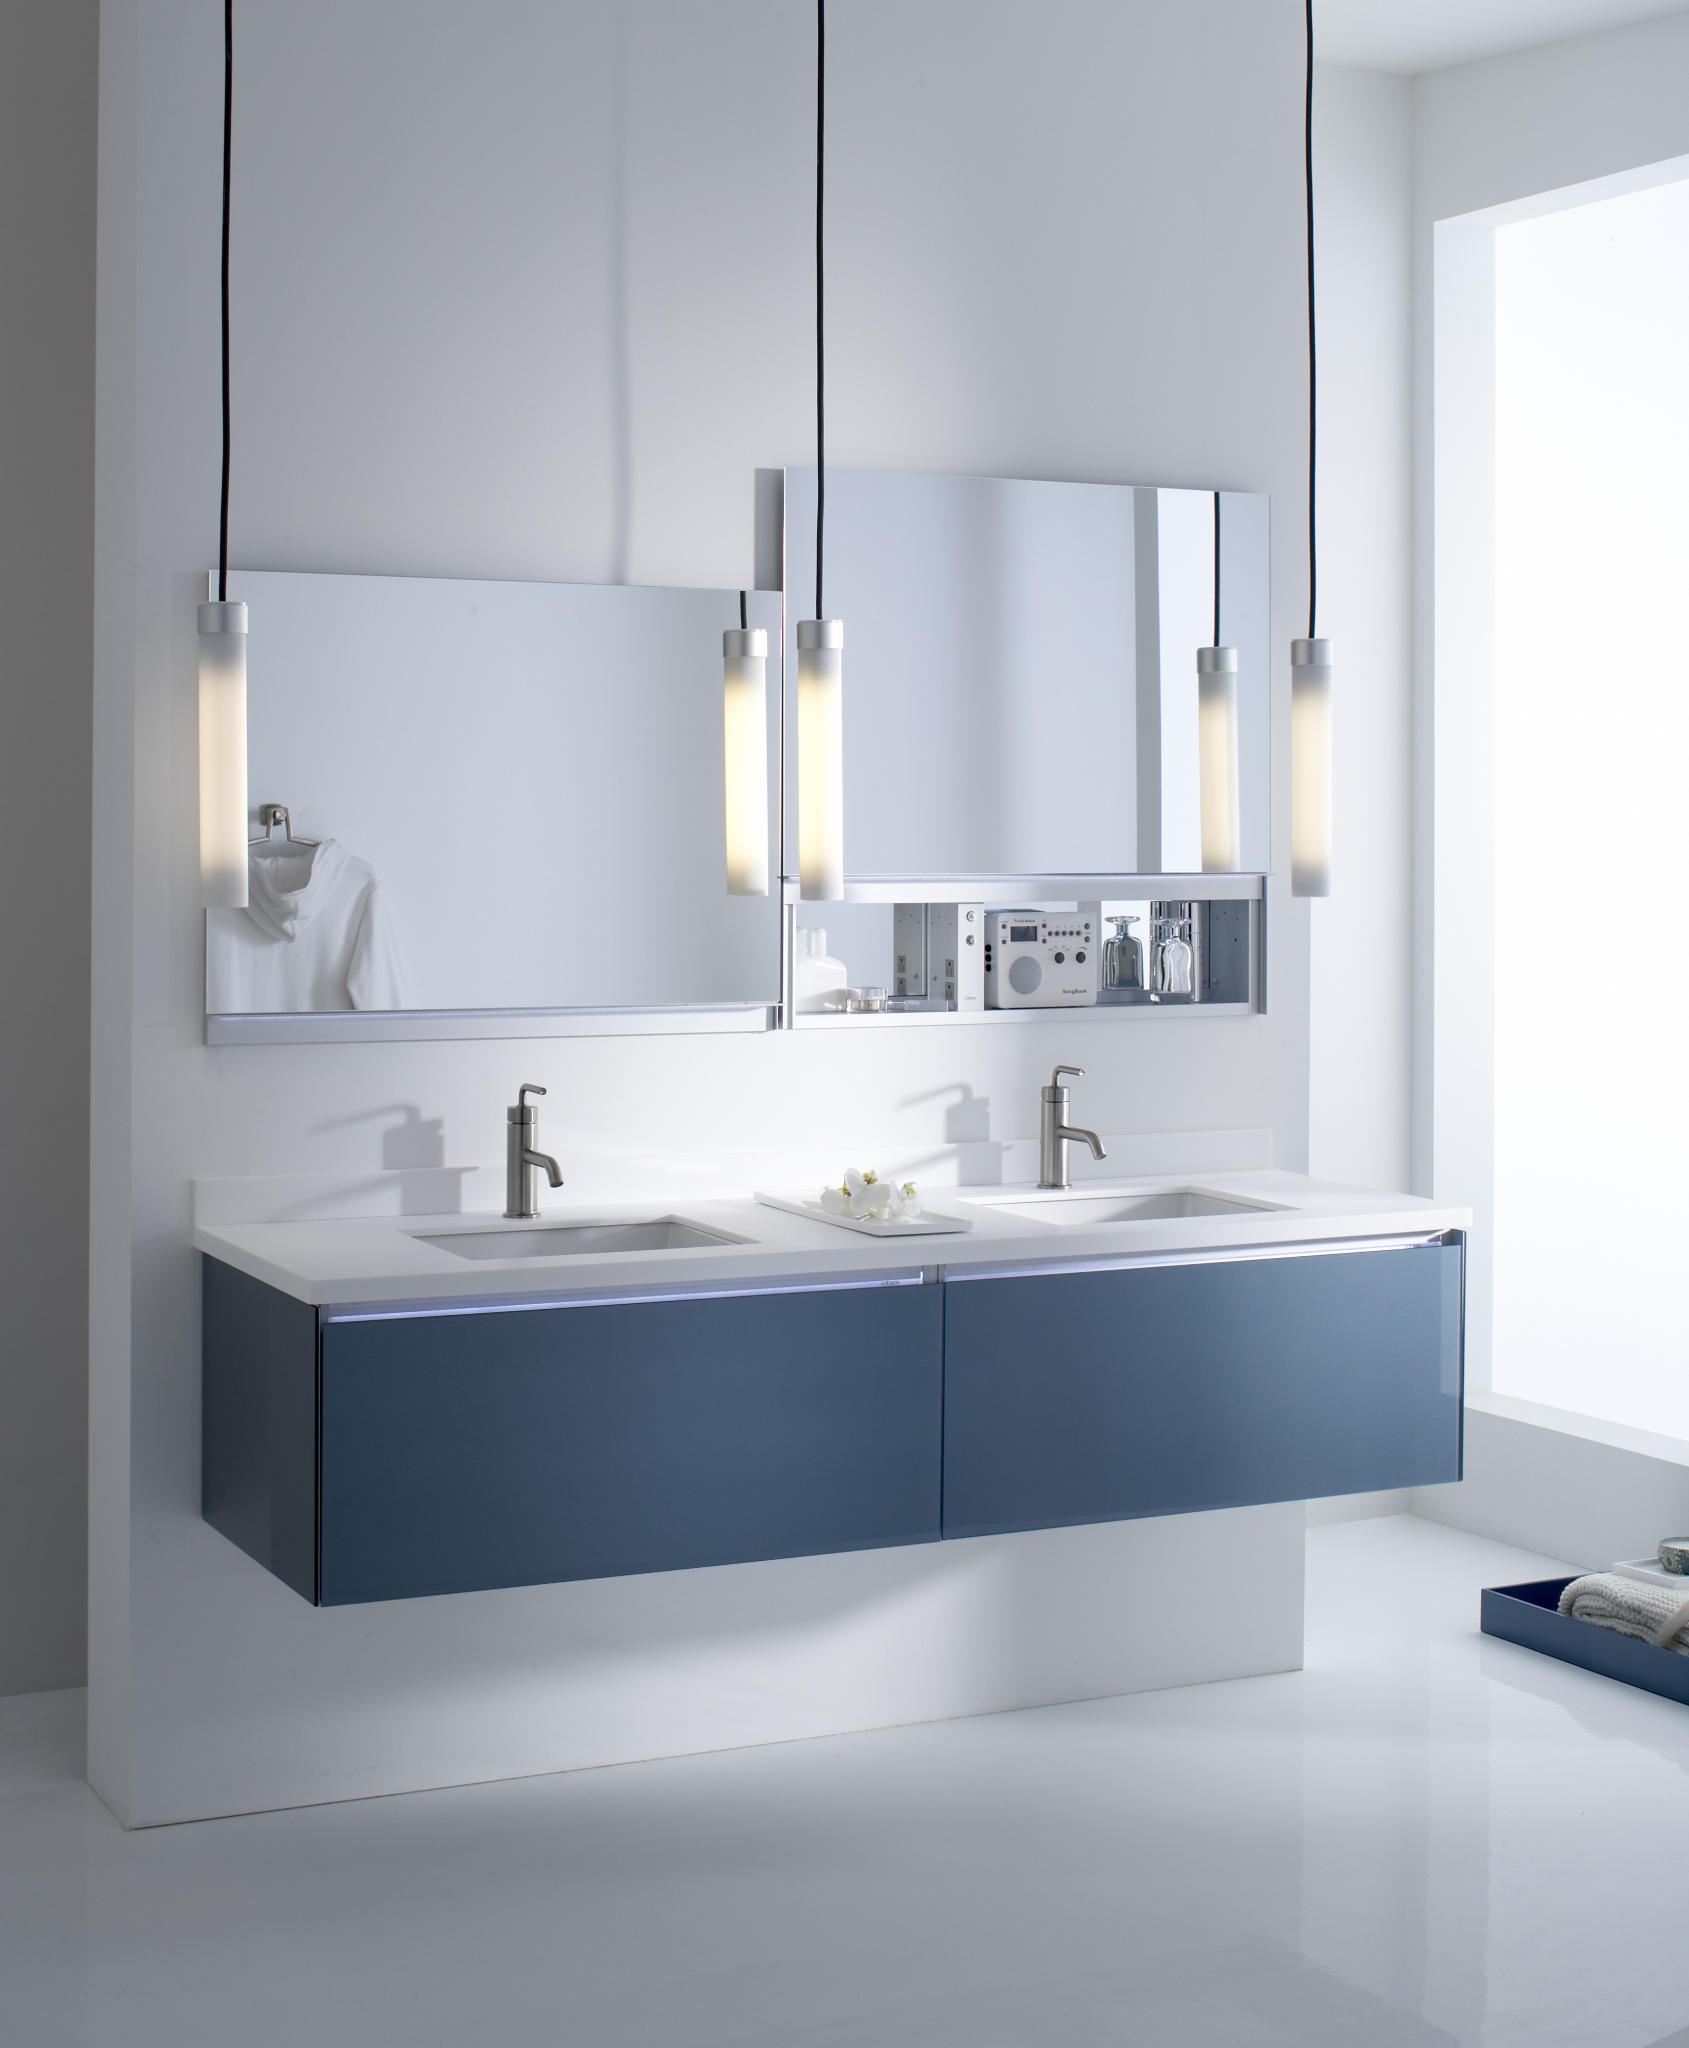 Kohler bathroom cabinets